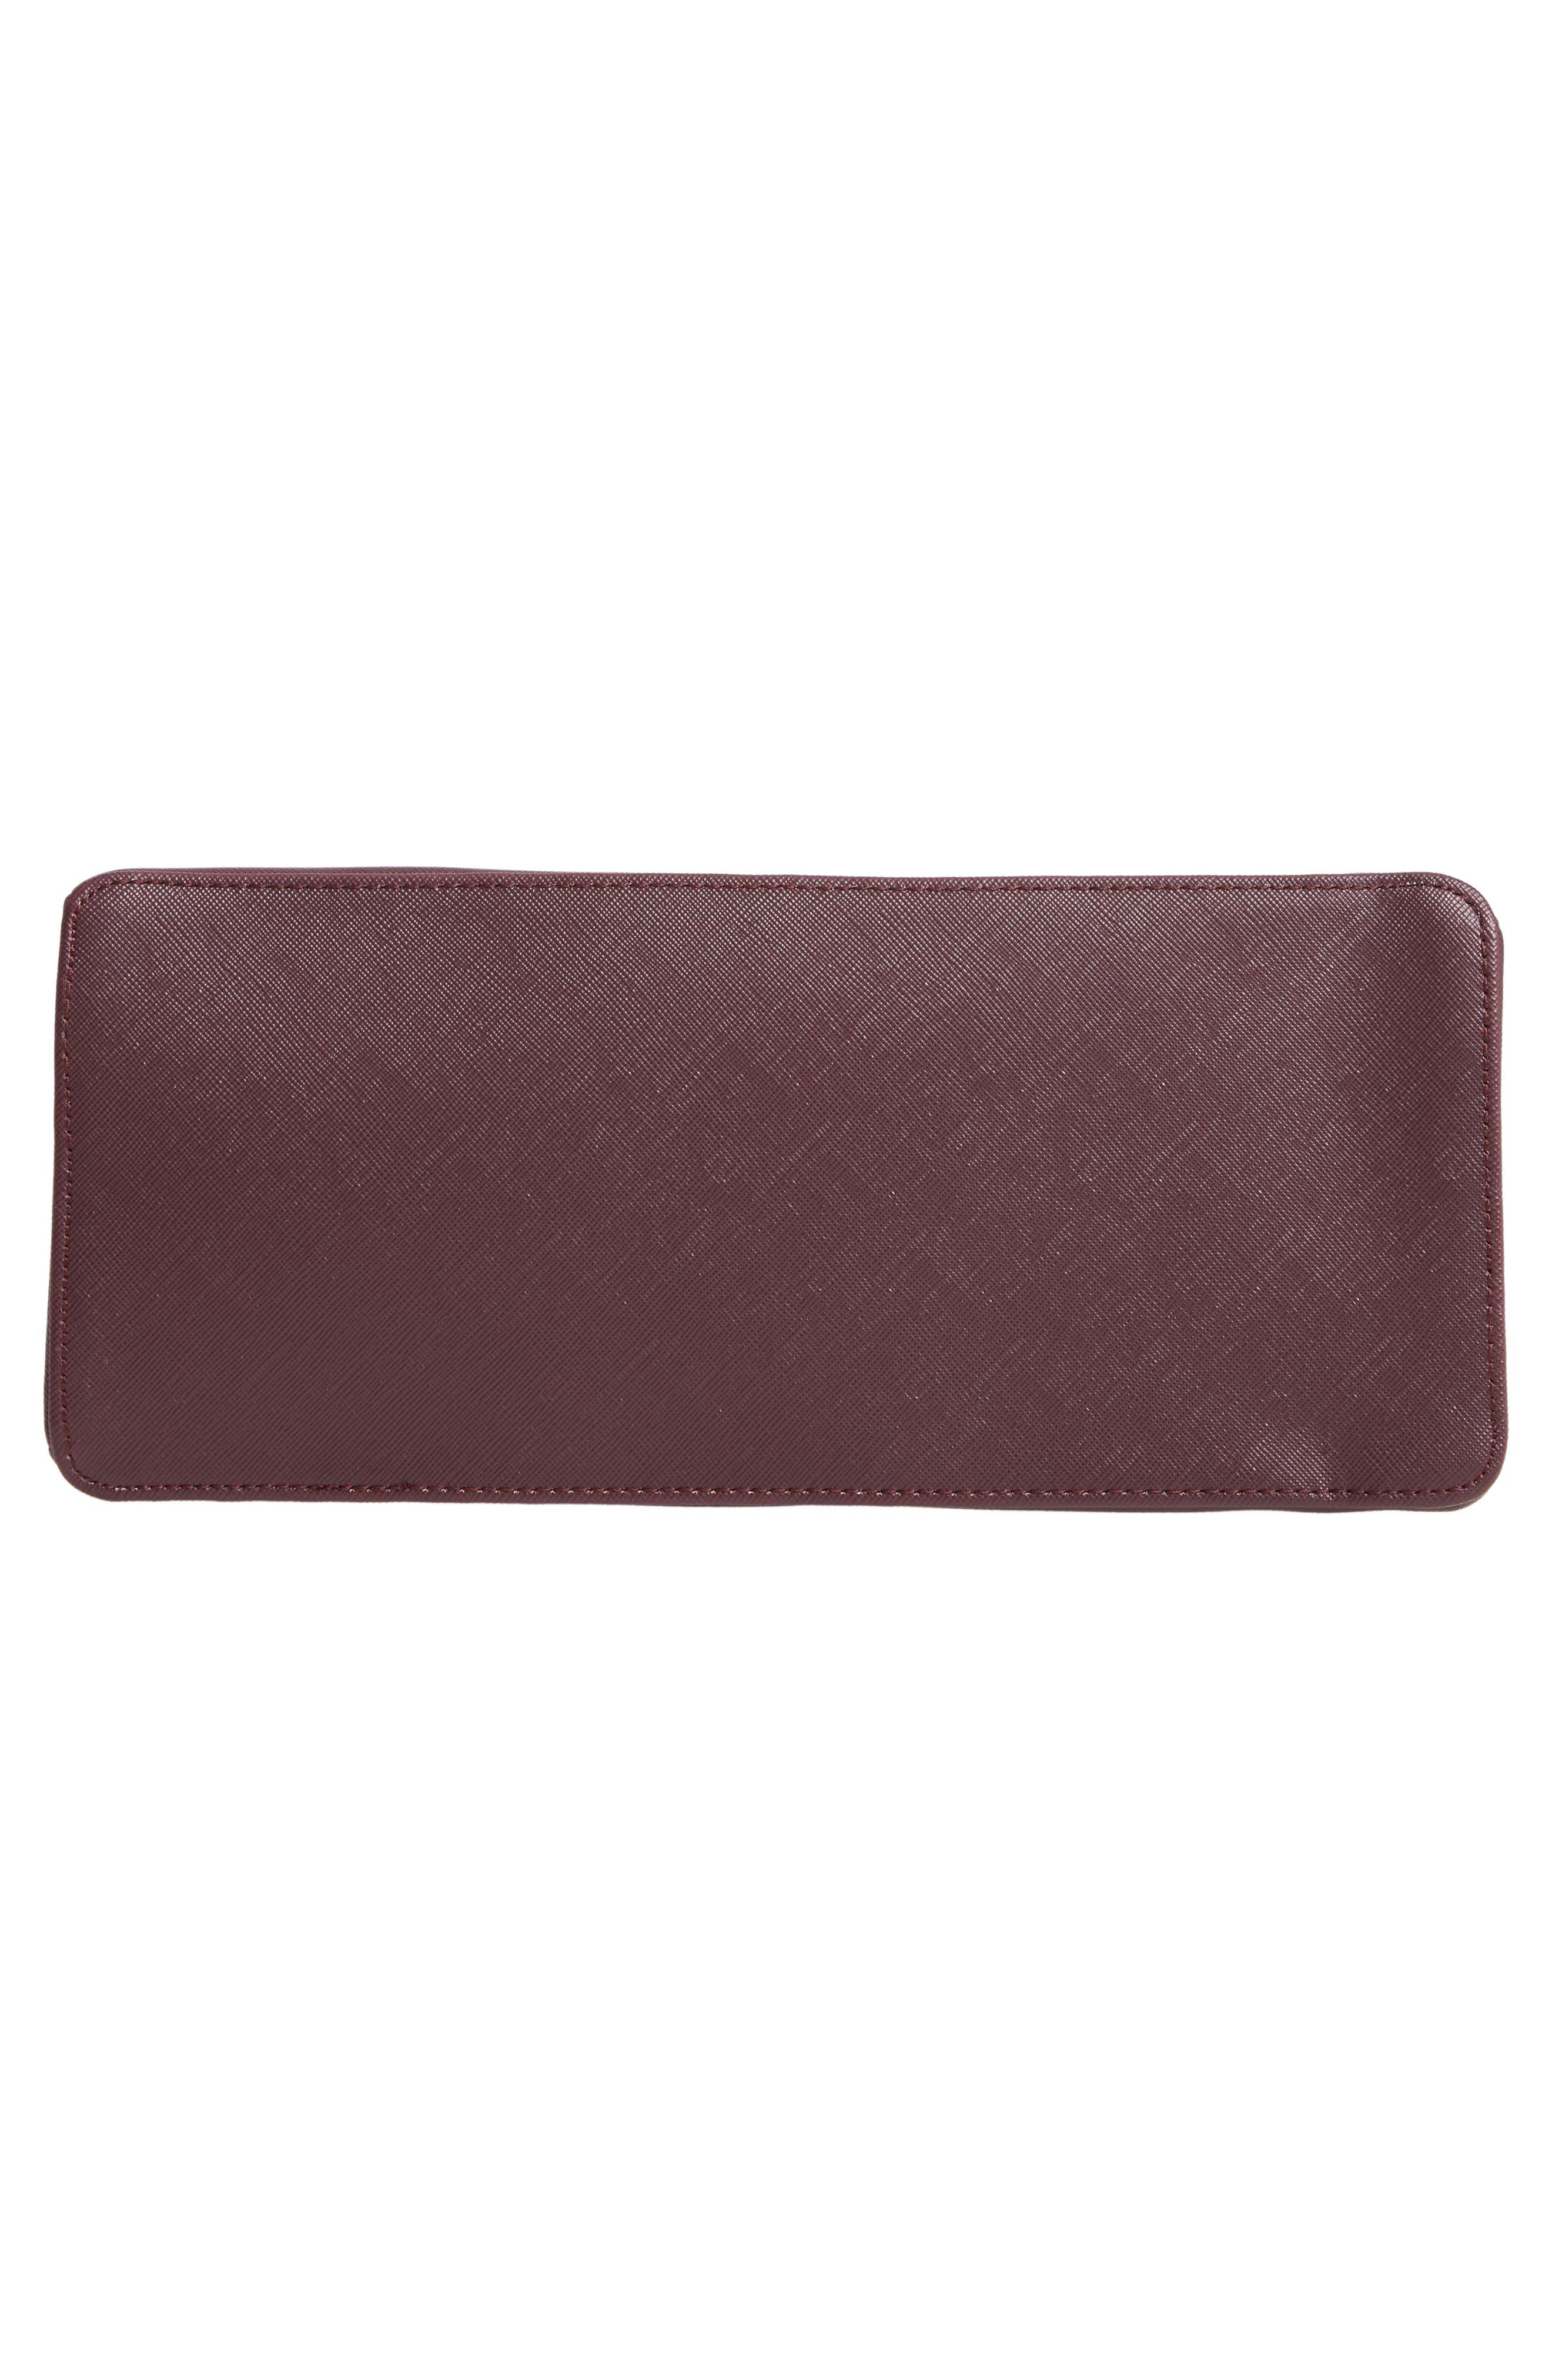 Keiira Lady Bag Faux Leather Top Handle Satchel,                             Alternate thumbnail 6, color,                             DEEP PURPLE